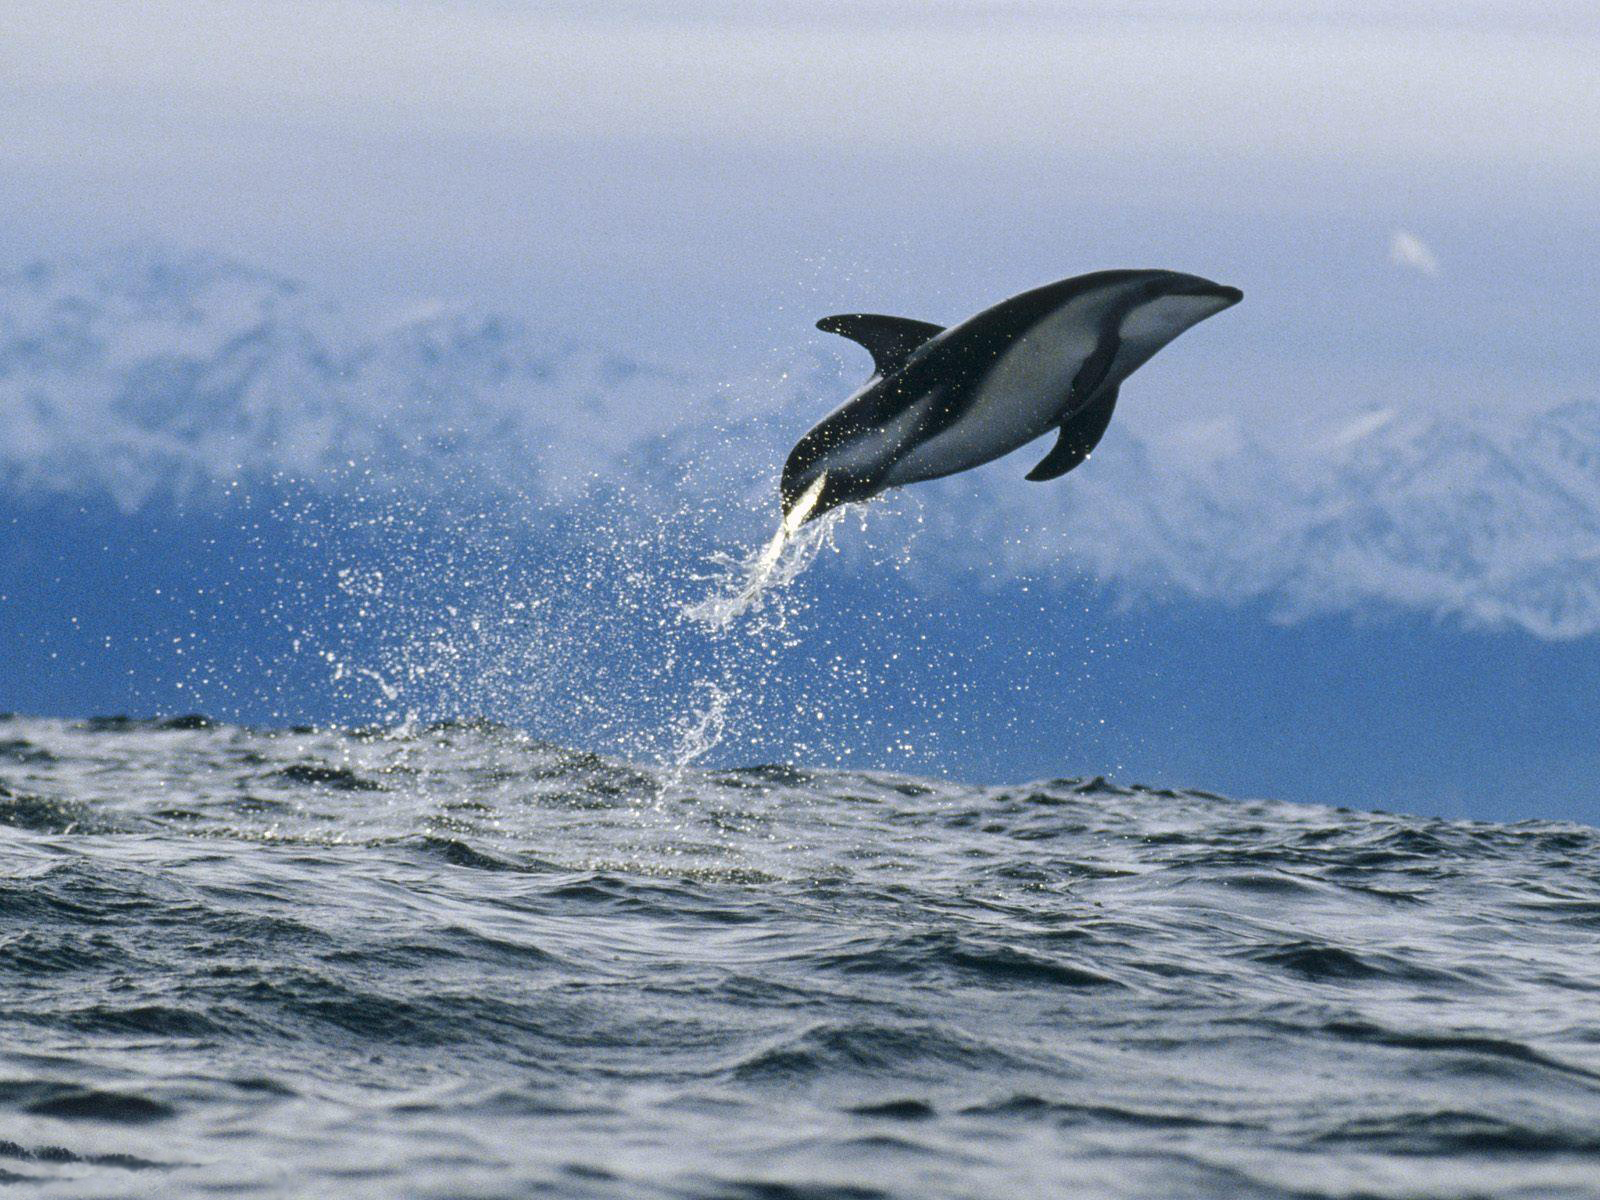 The best top desktop dolphin wallpapers hd dolphins wallpaper 24jpeg 1600x1200